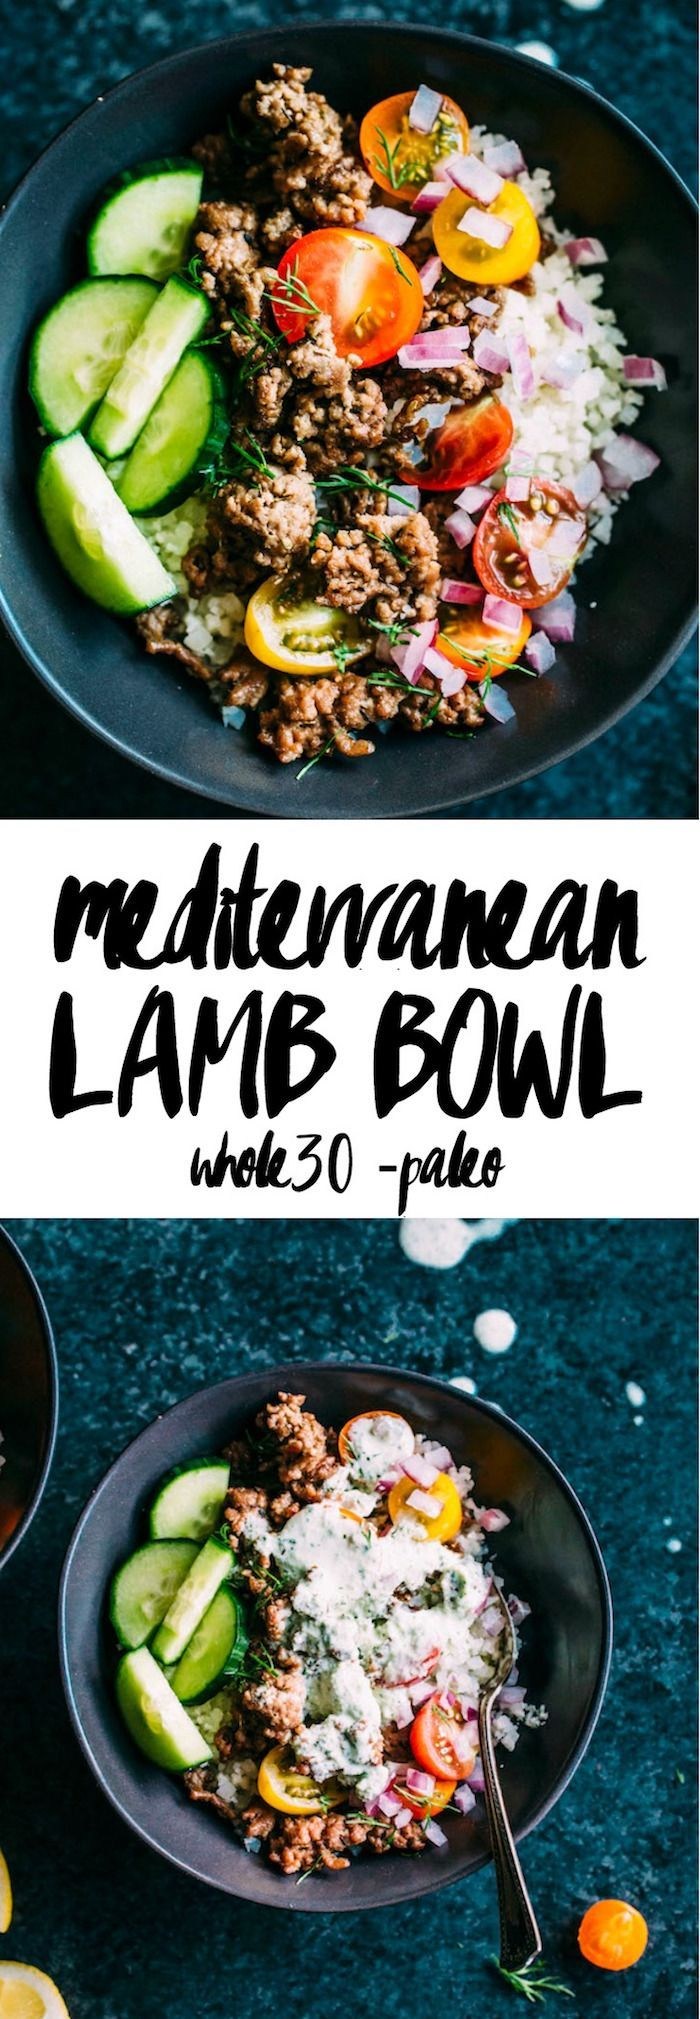 Mediterranean Lamb Bowl made with cauliflower rice, lamb and paleo-friendly tzatziki sauce | thealmondeater.com